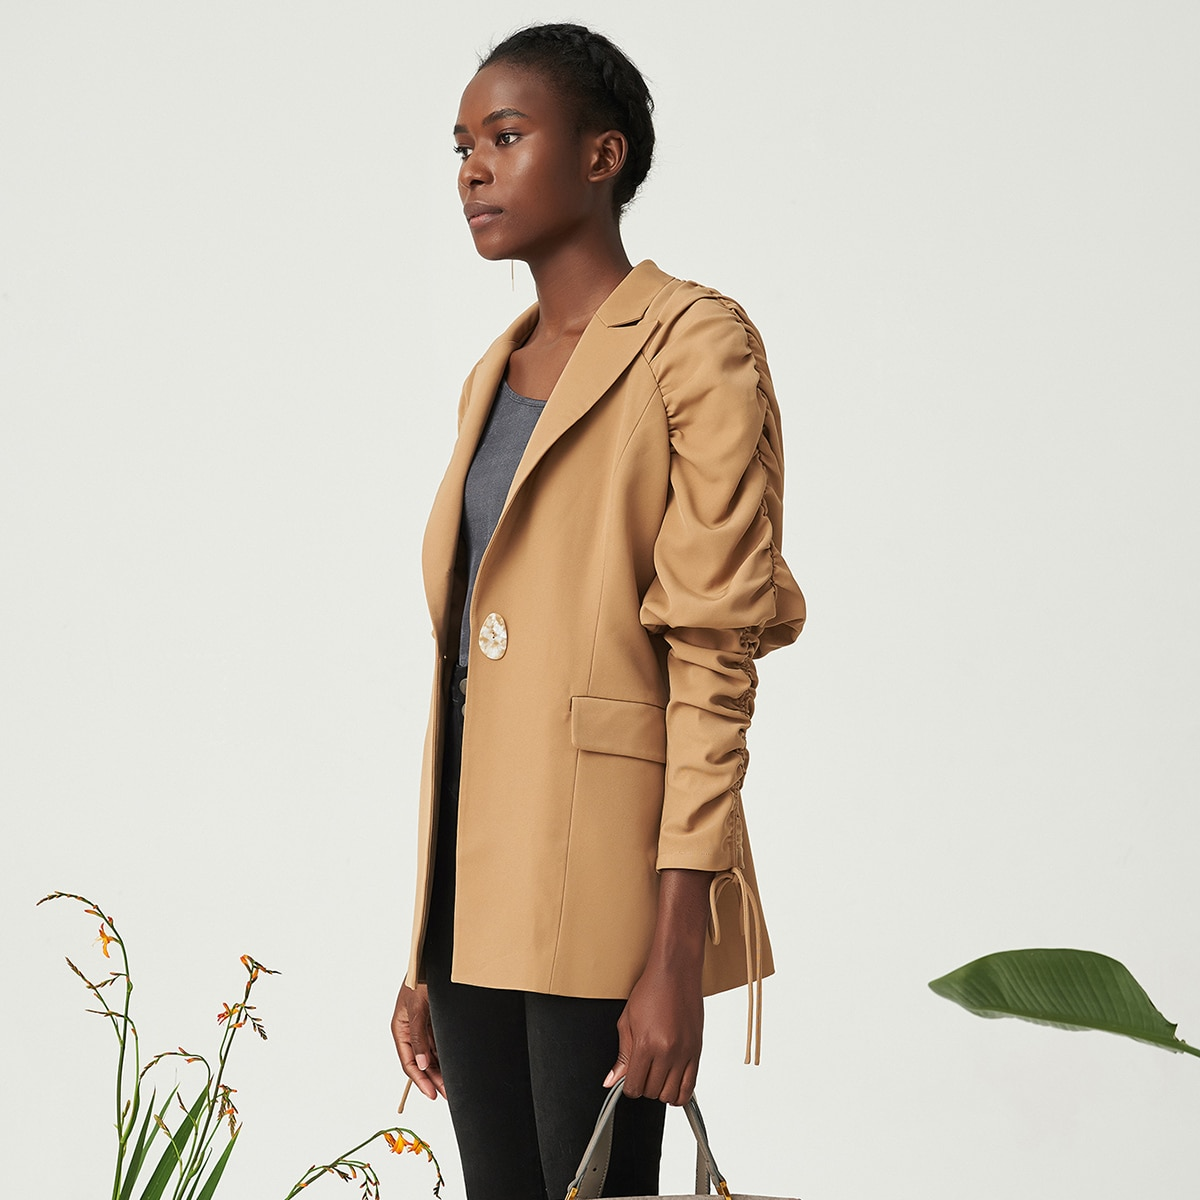 Пиджак на кулиске со сборкой на рукавах от SHEIN